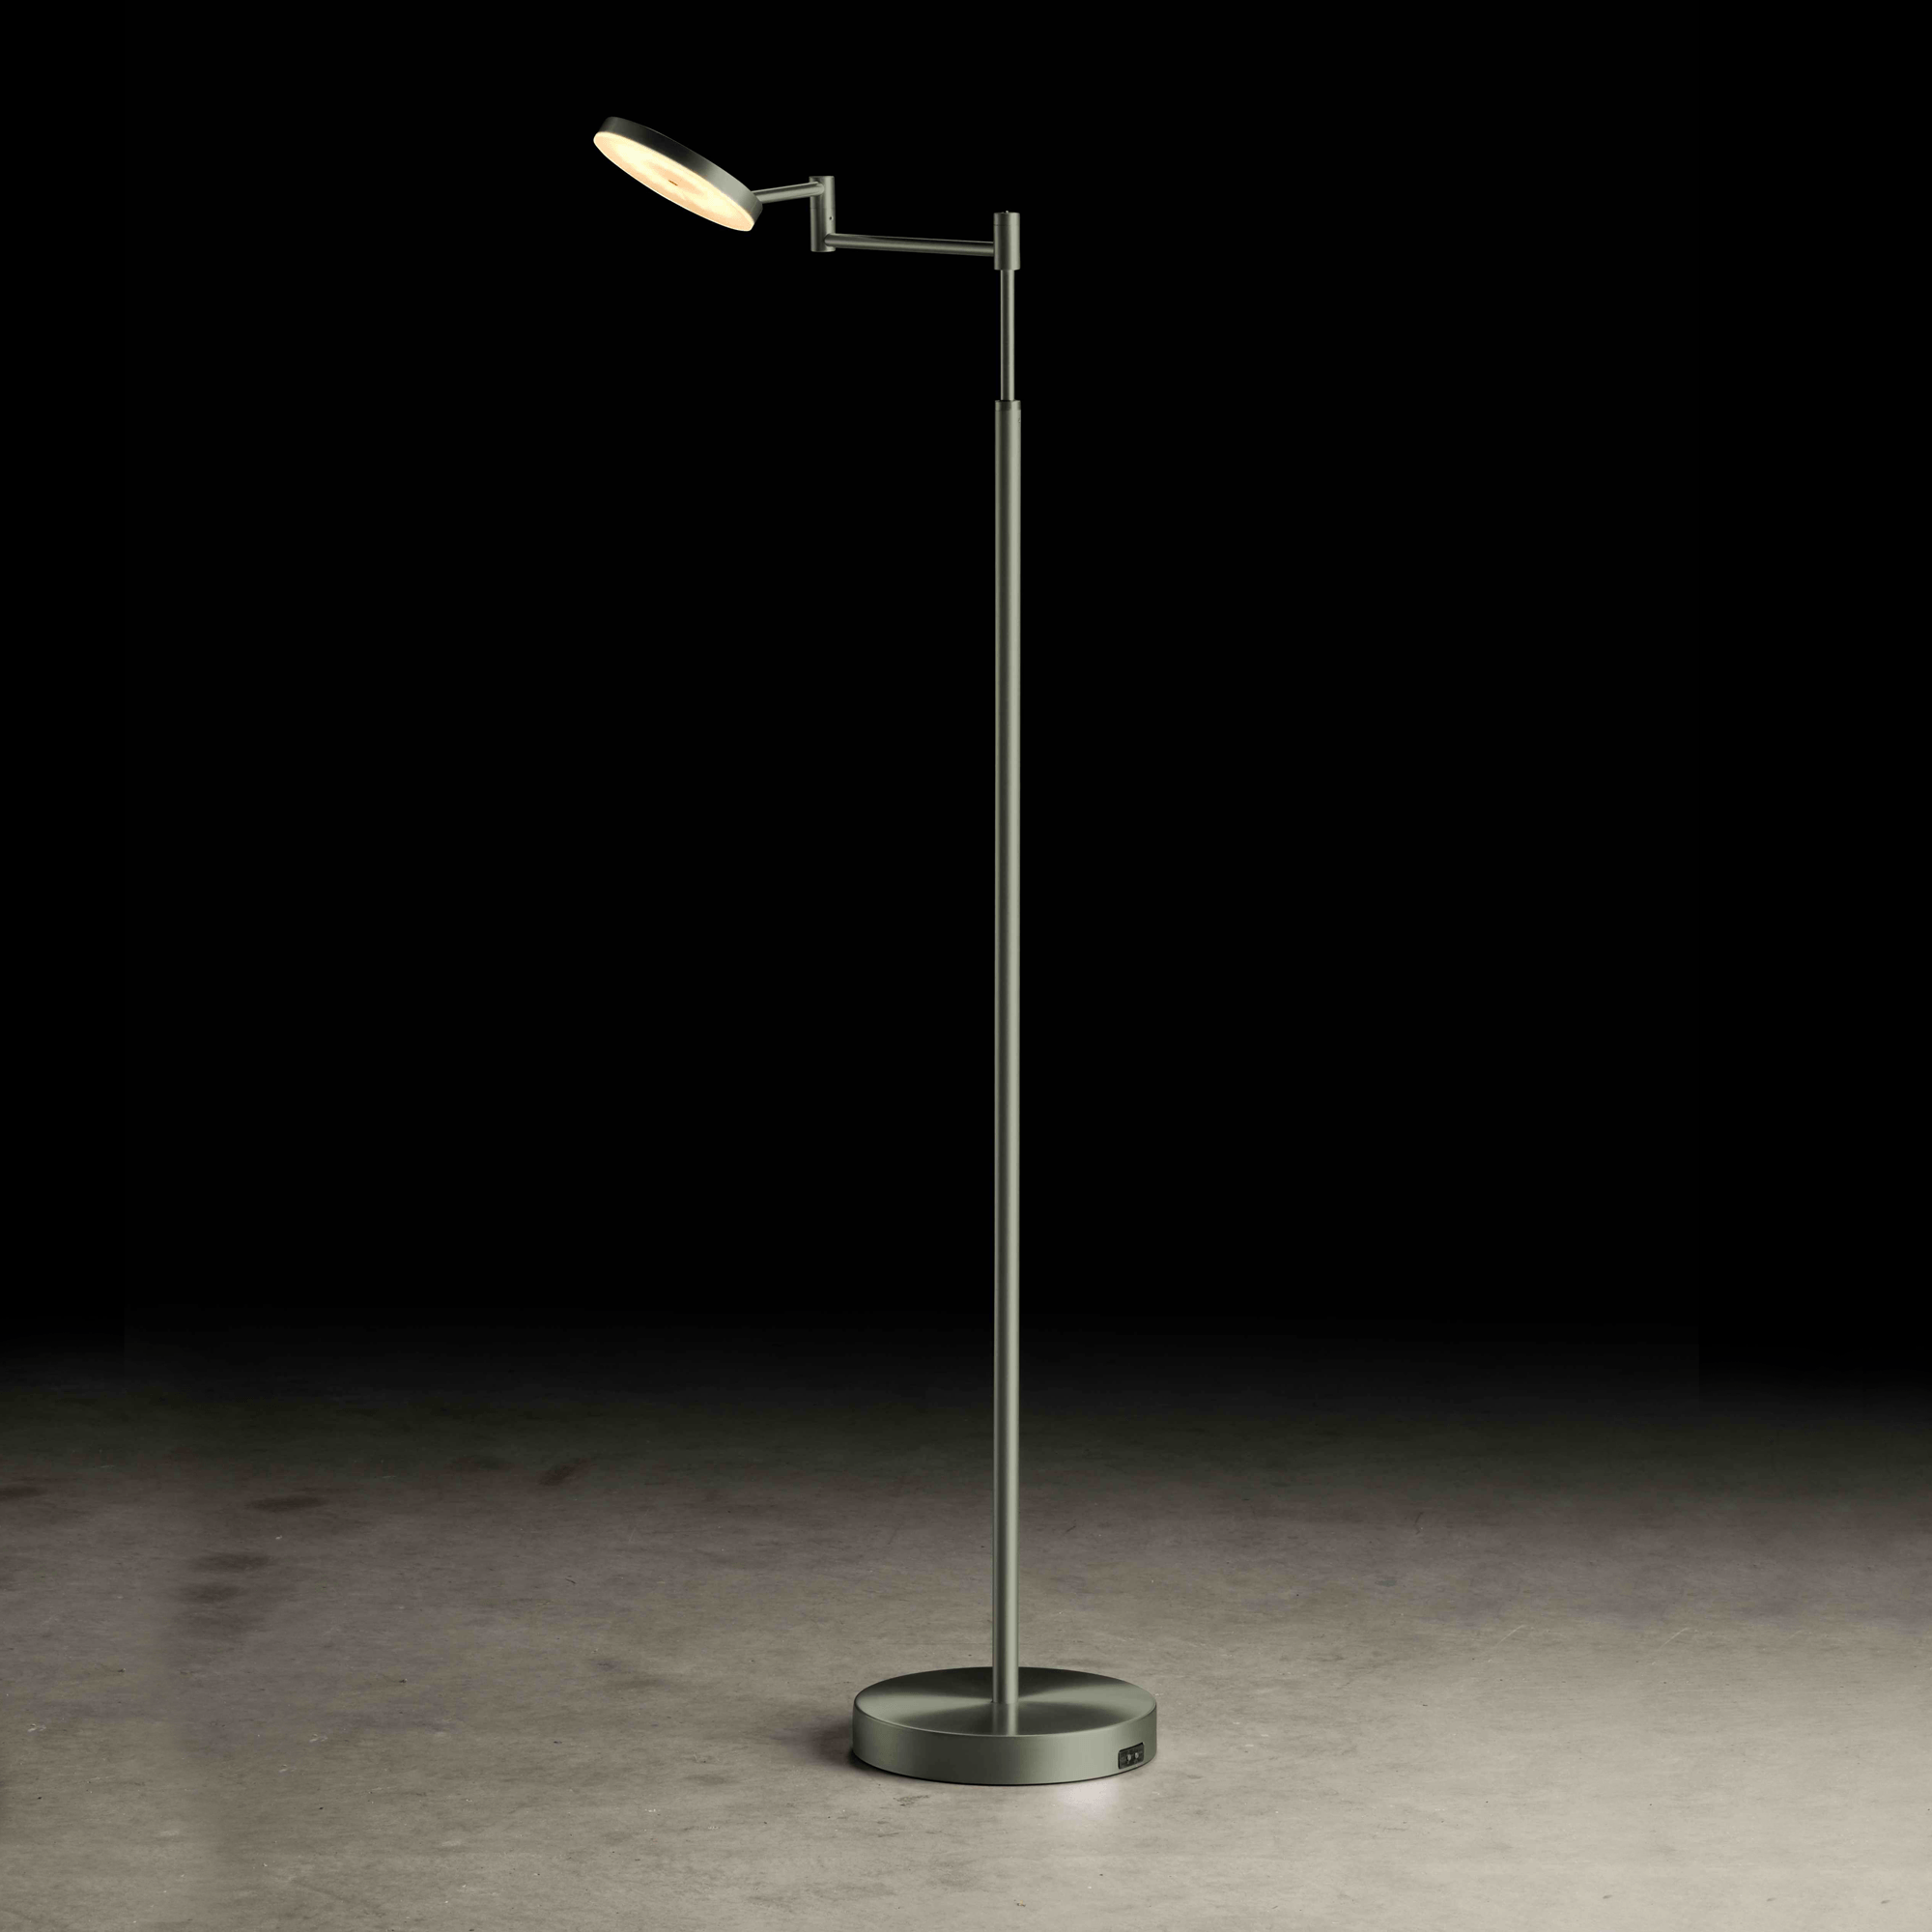 Vloerlamp Holtkotter Plano Akku Platin